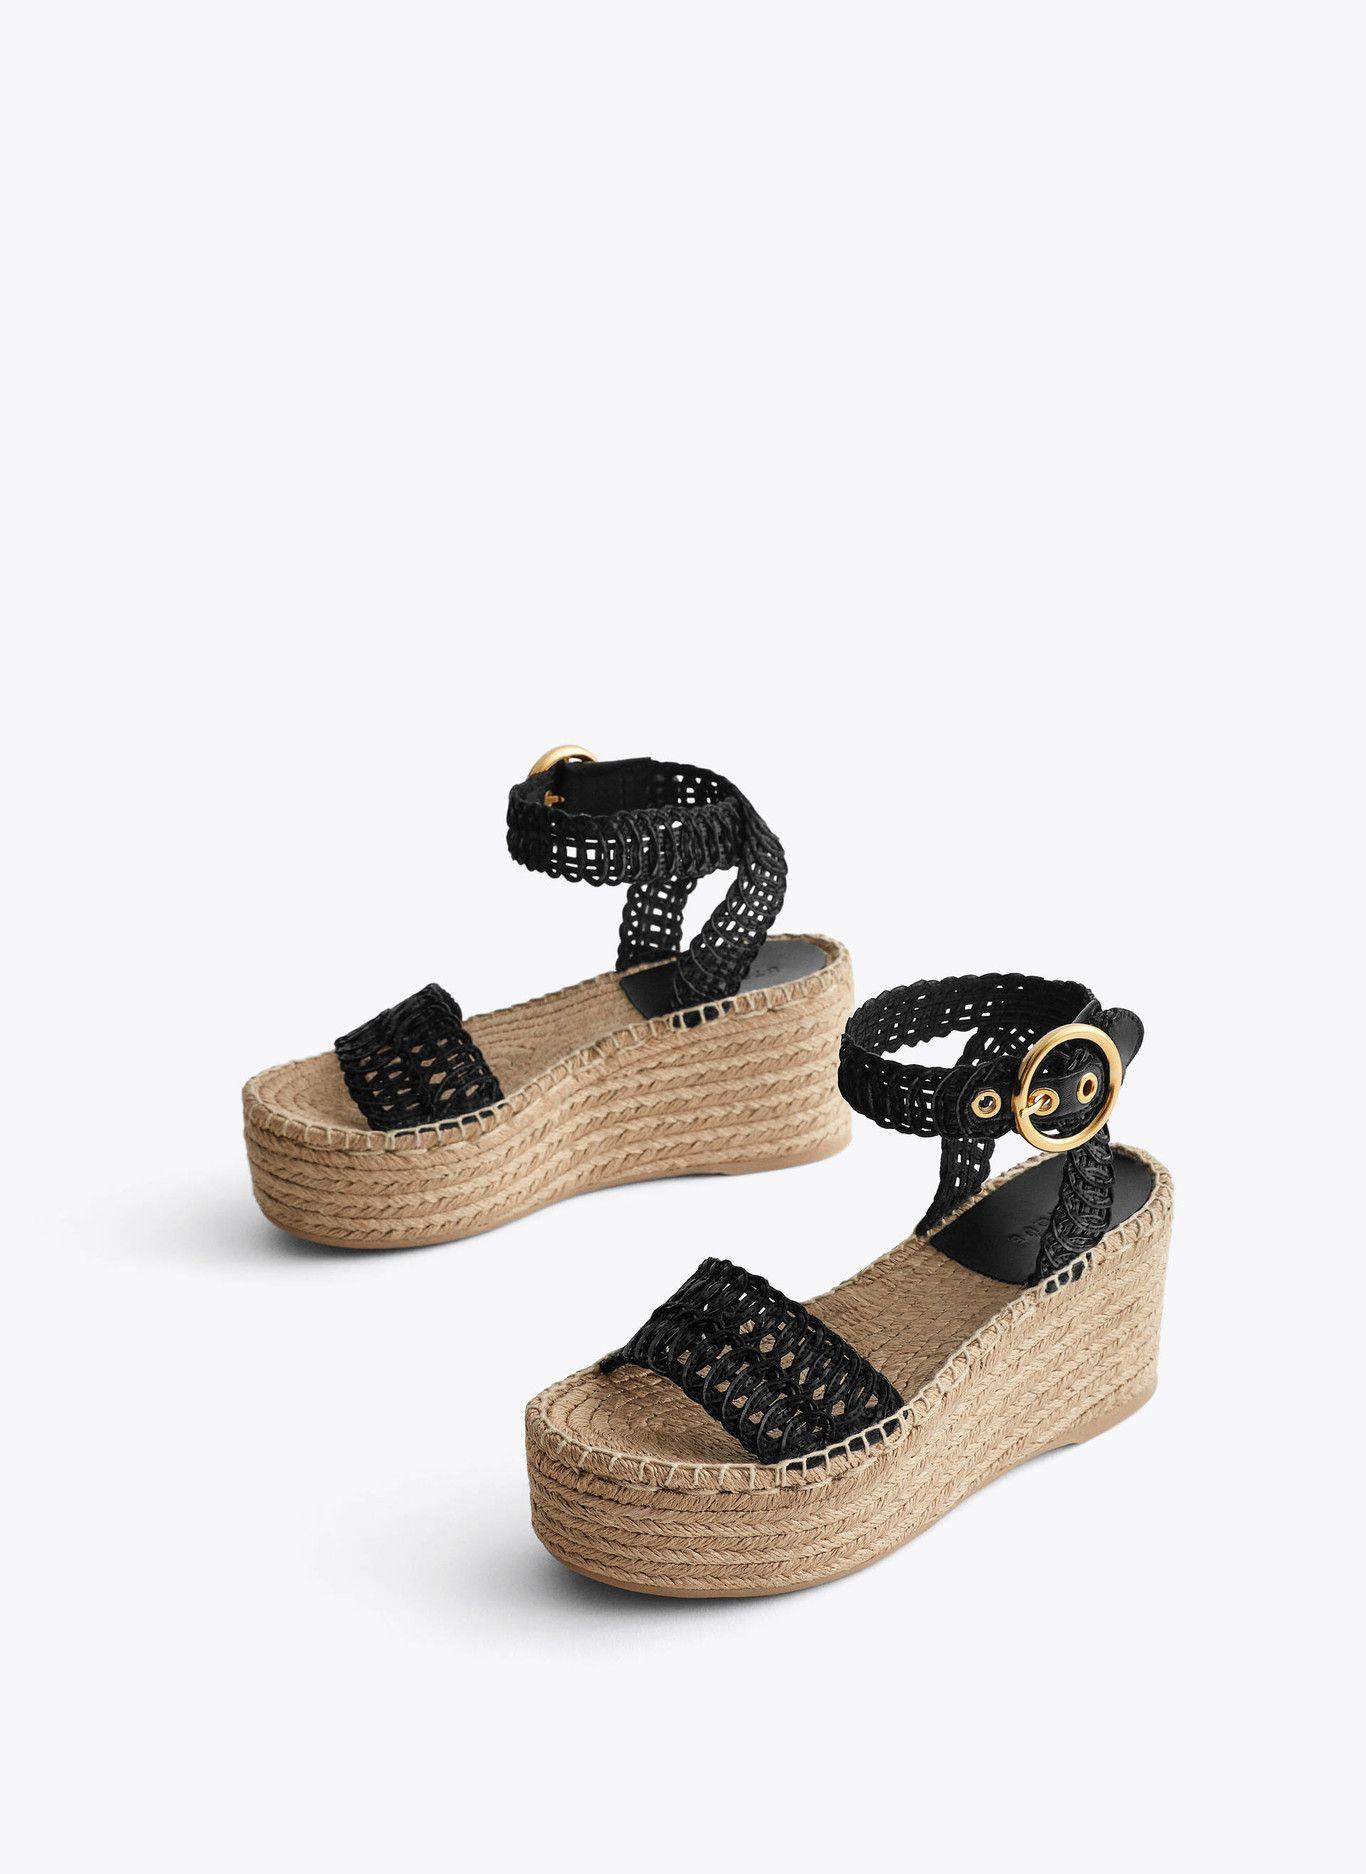 13 sandalias de esparto (con plataforma) para ver la vida